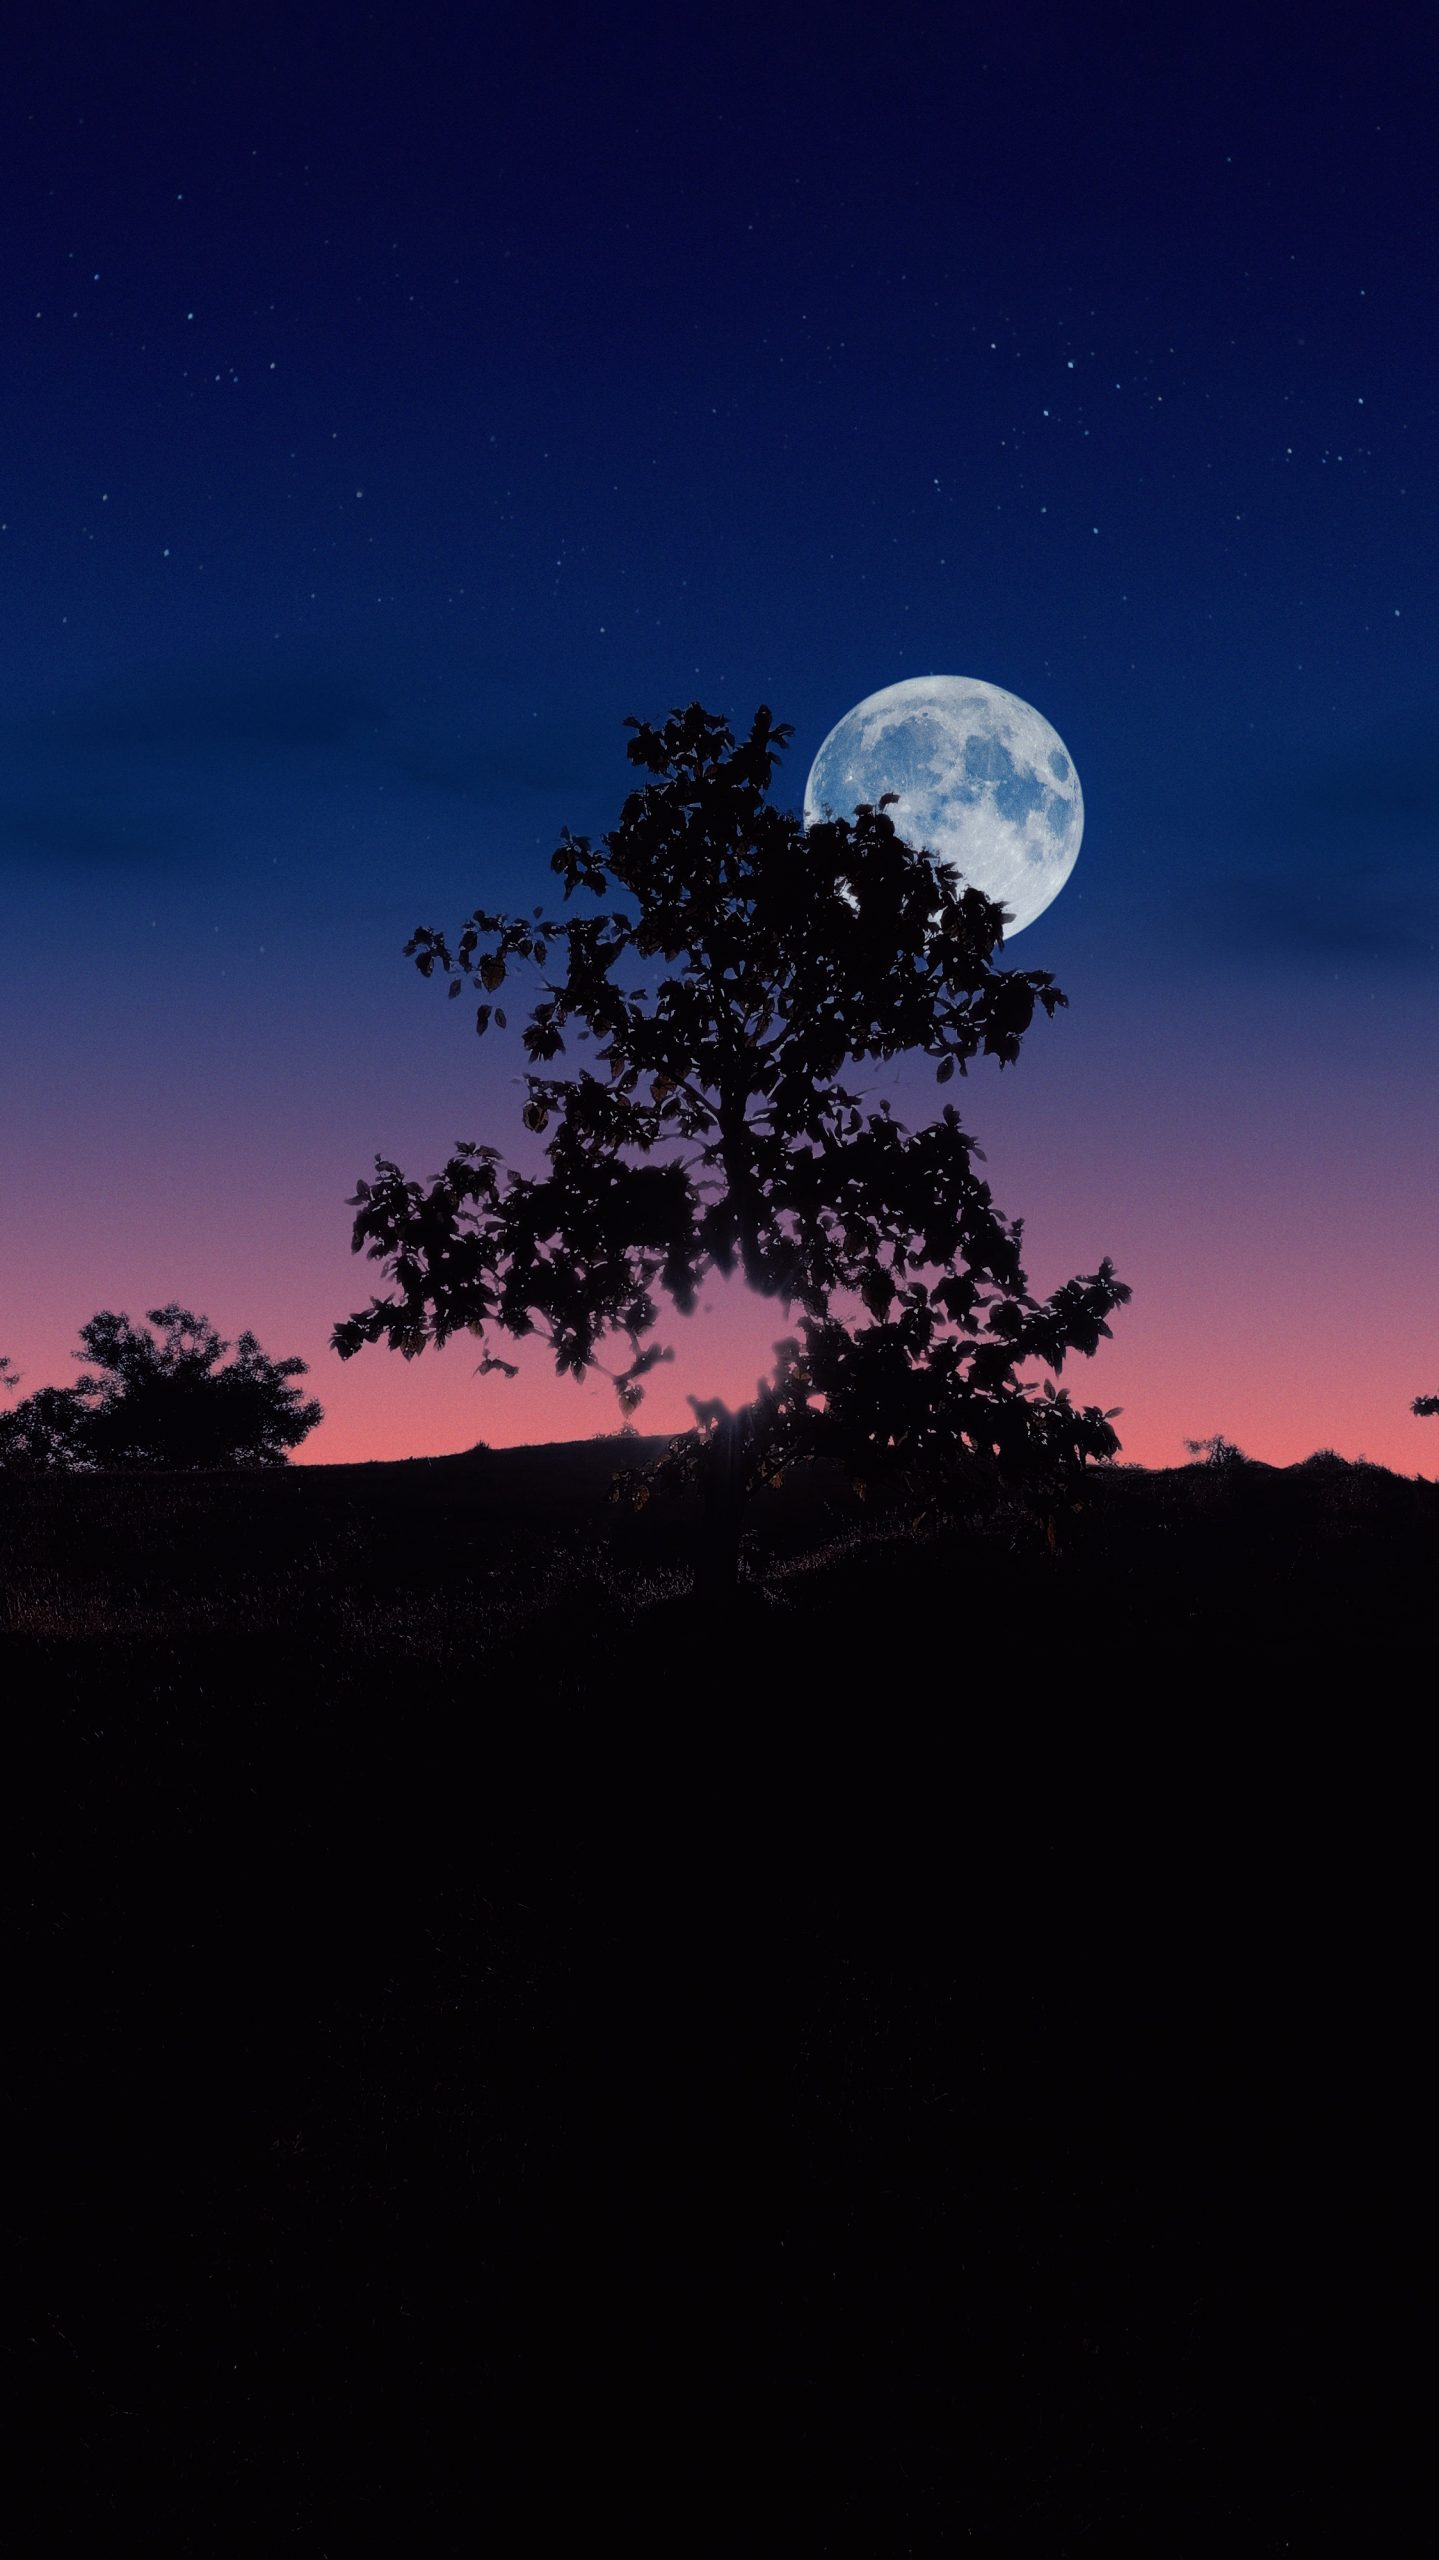 Night view of tree